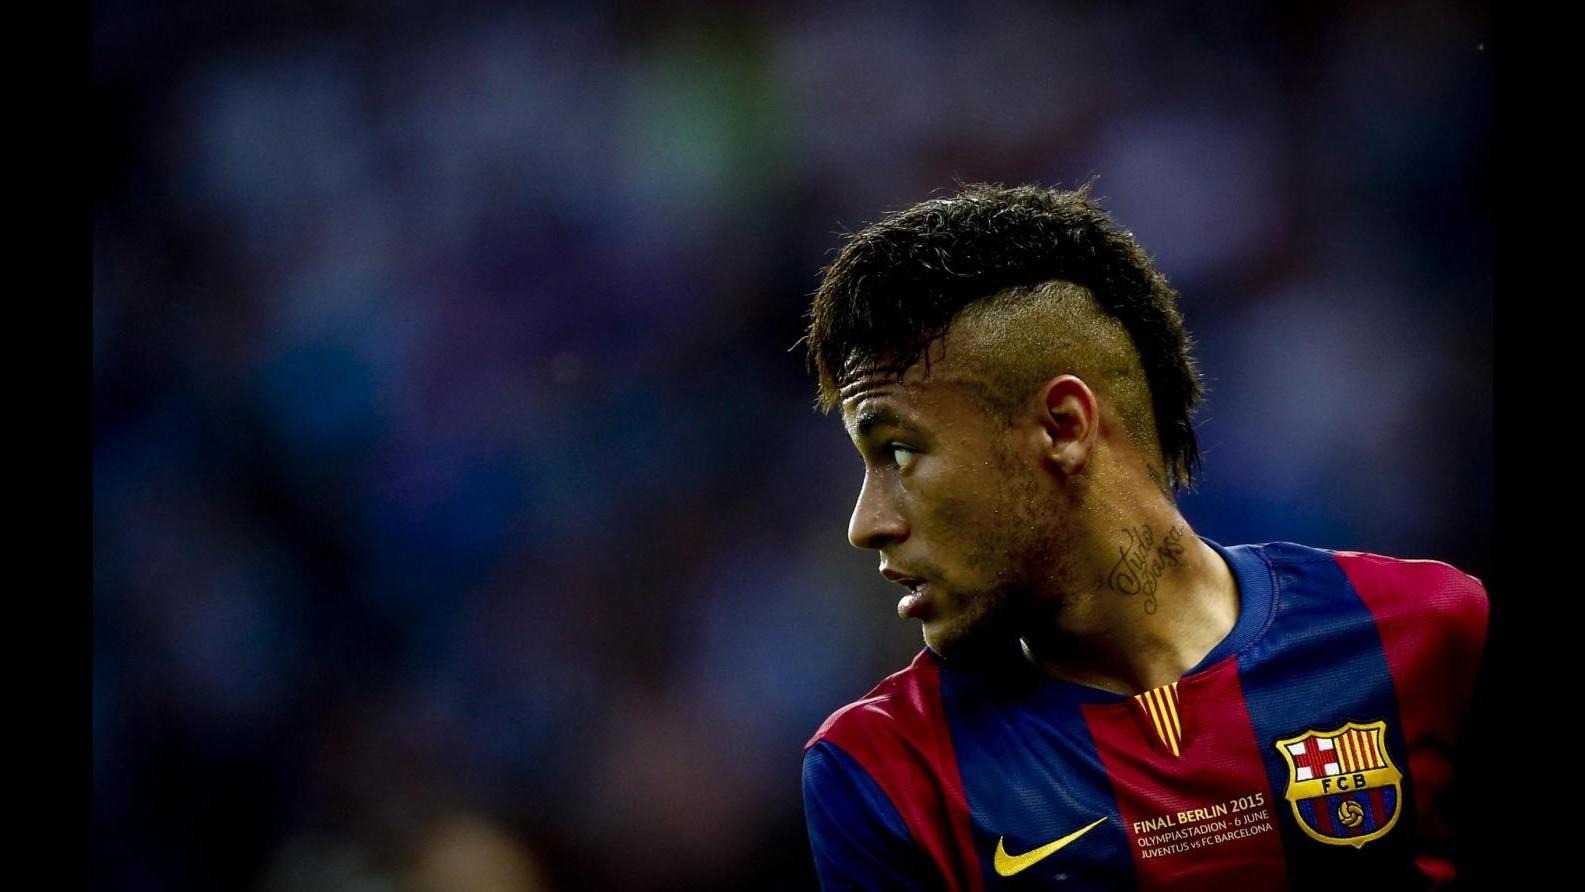 Stampa GB: Arsenal su Cavani, United tra Neymar e Bale